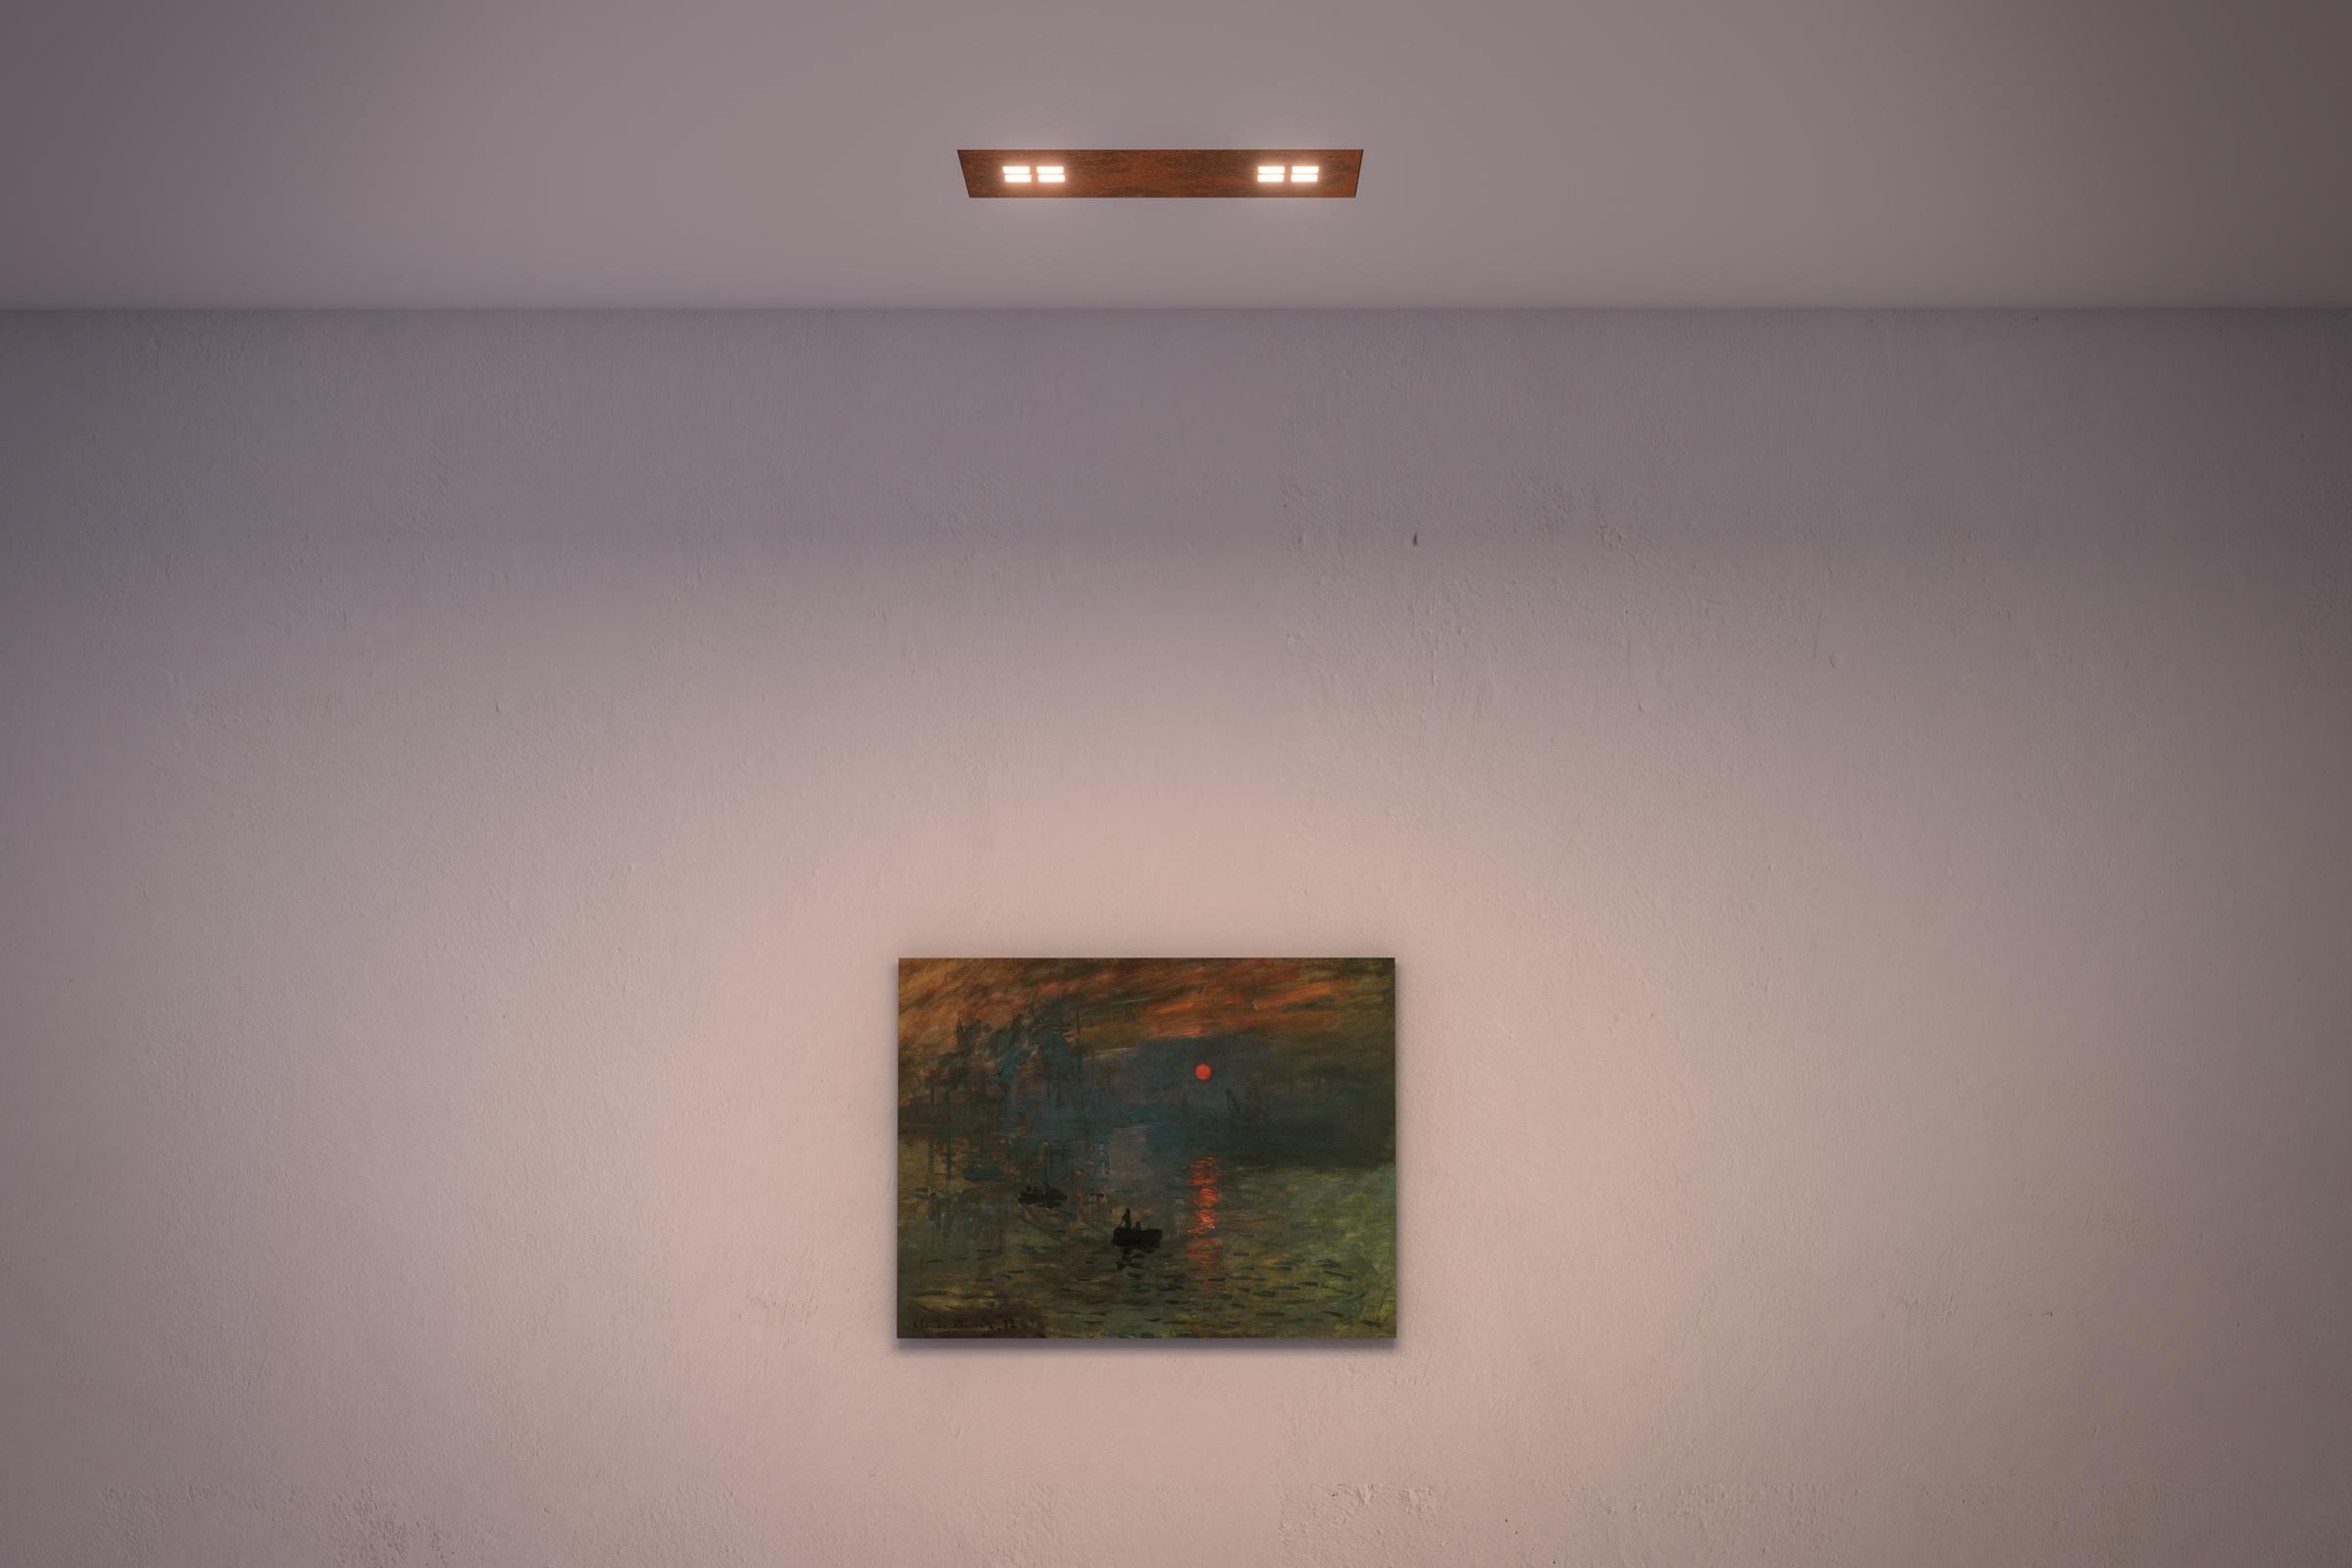 ailis lighting solutions - zen 2 - Soggiorno Stile Zen 2